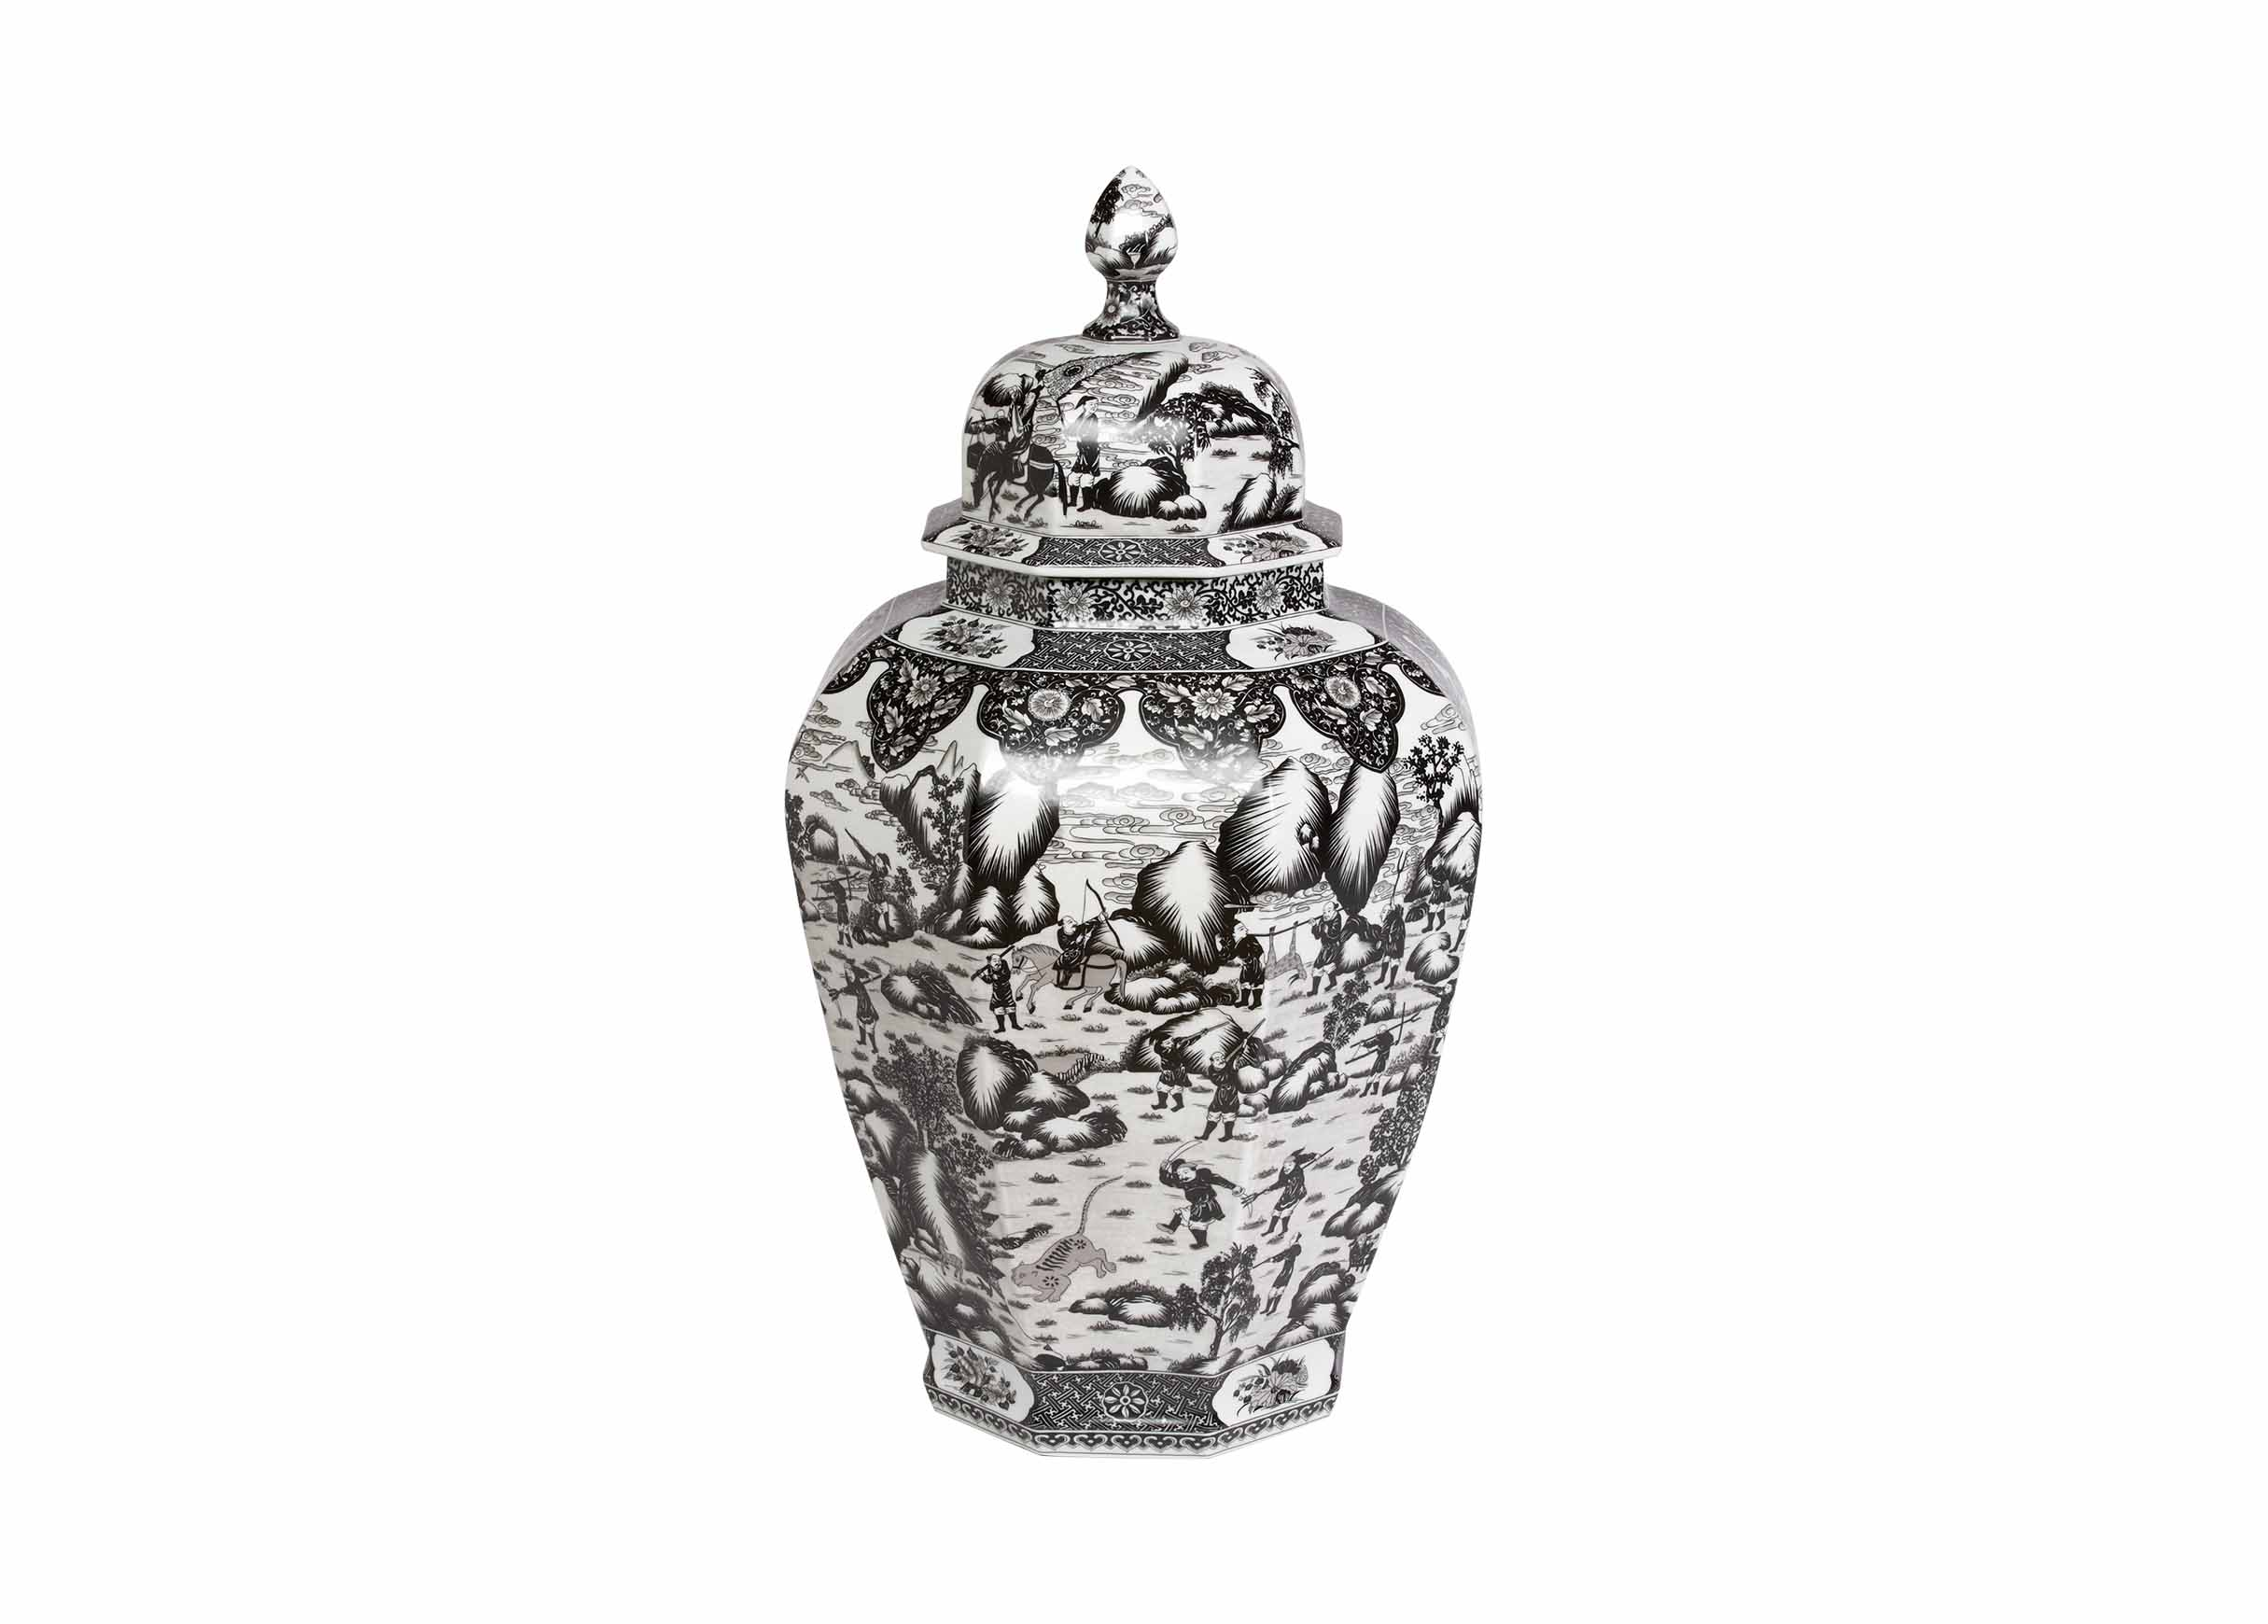 extra large black and white ginger jar bottles u0026 jars